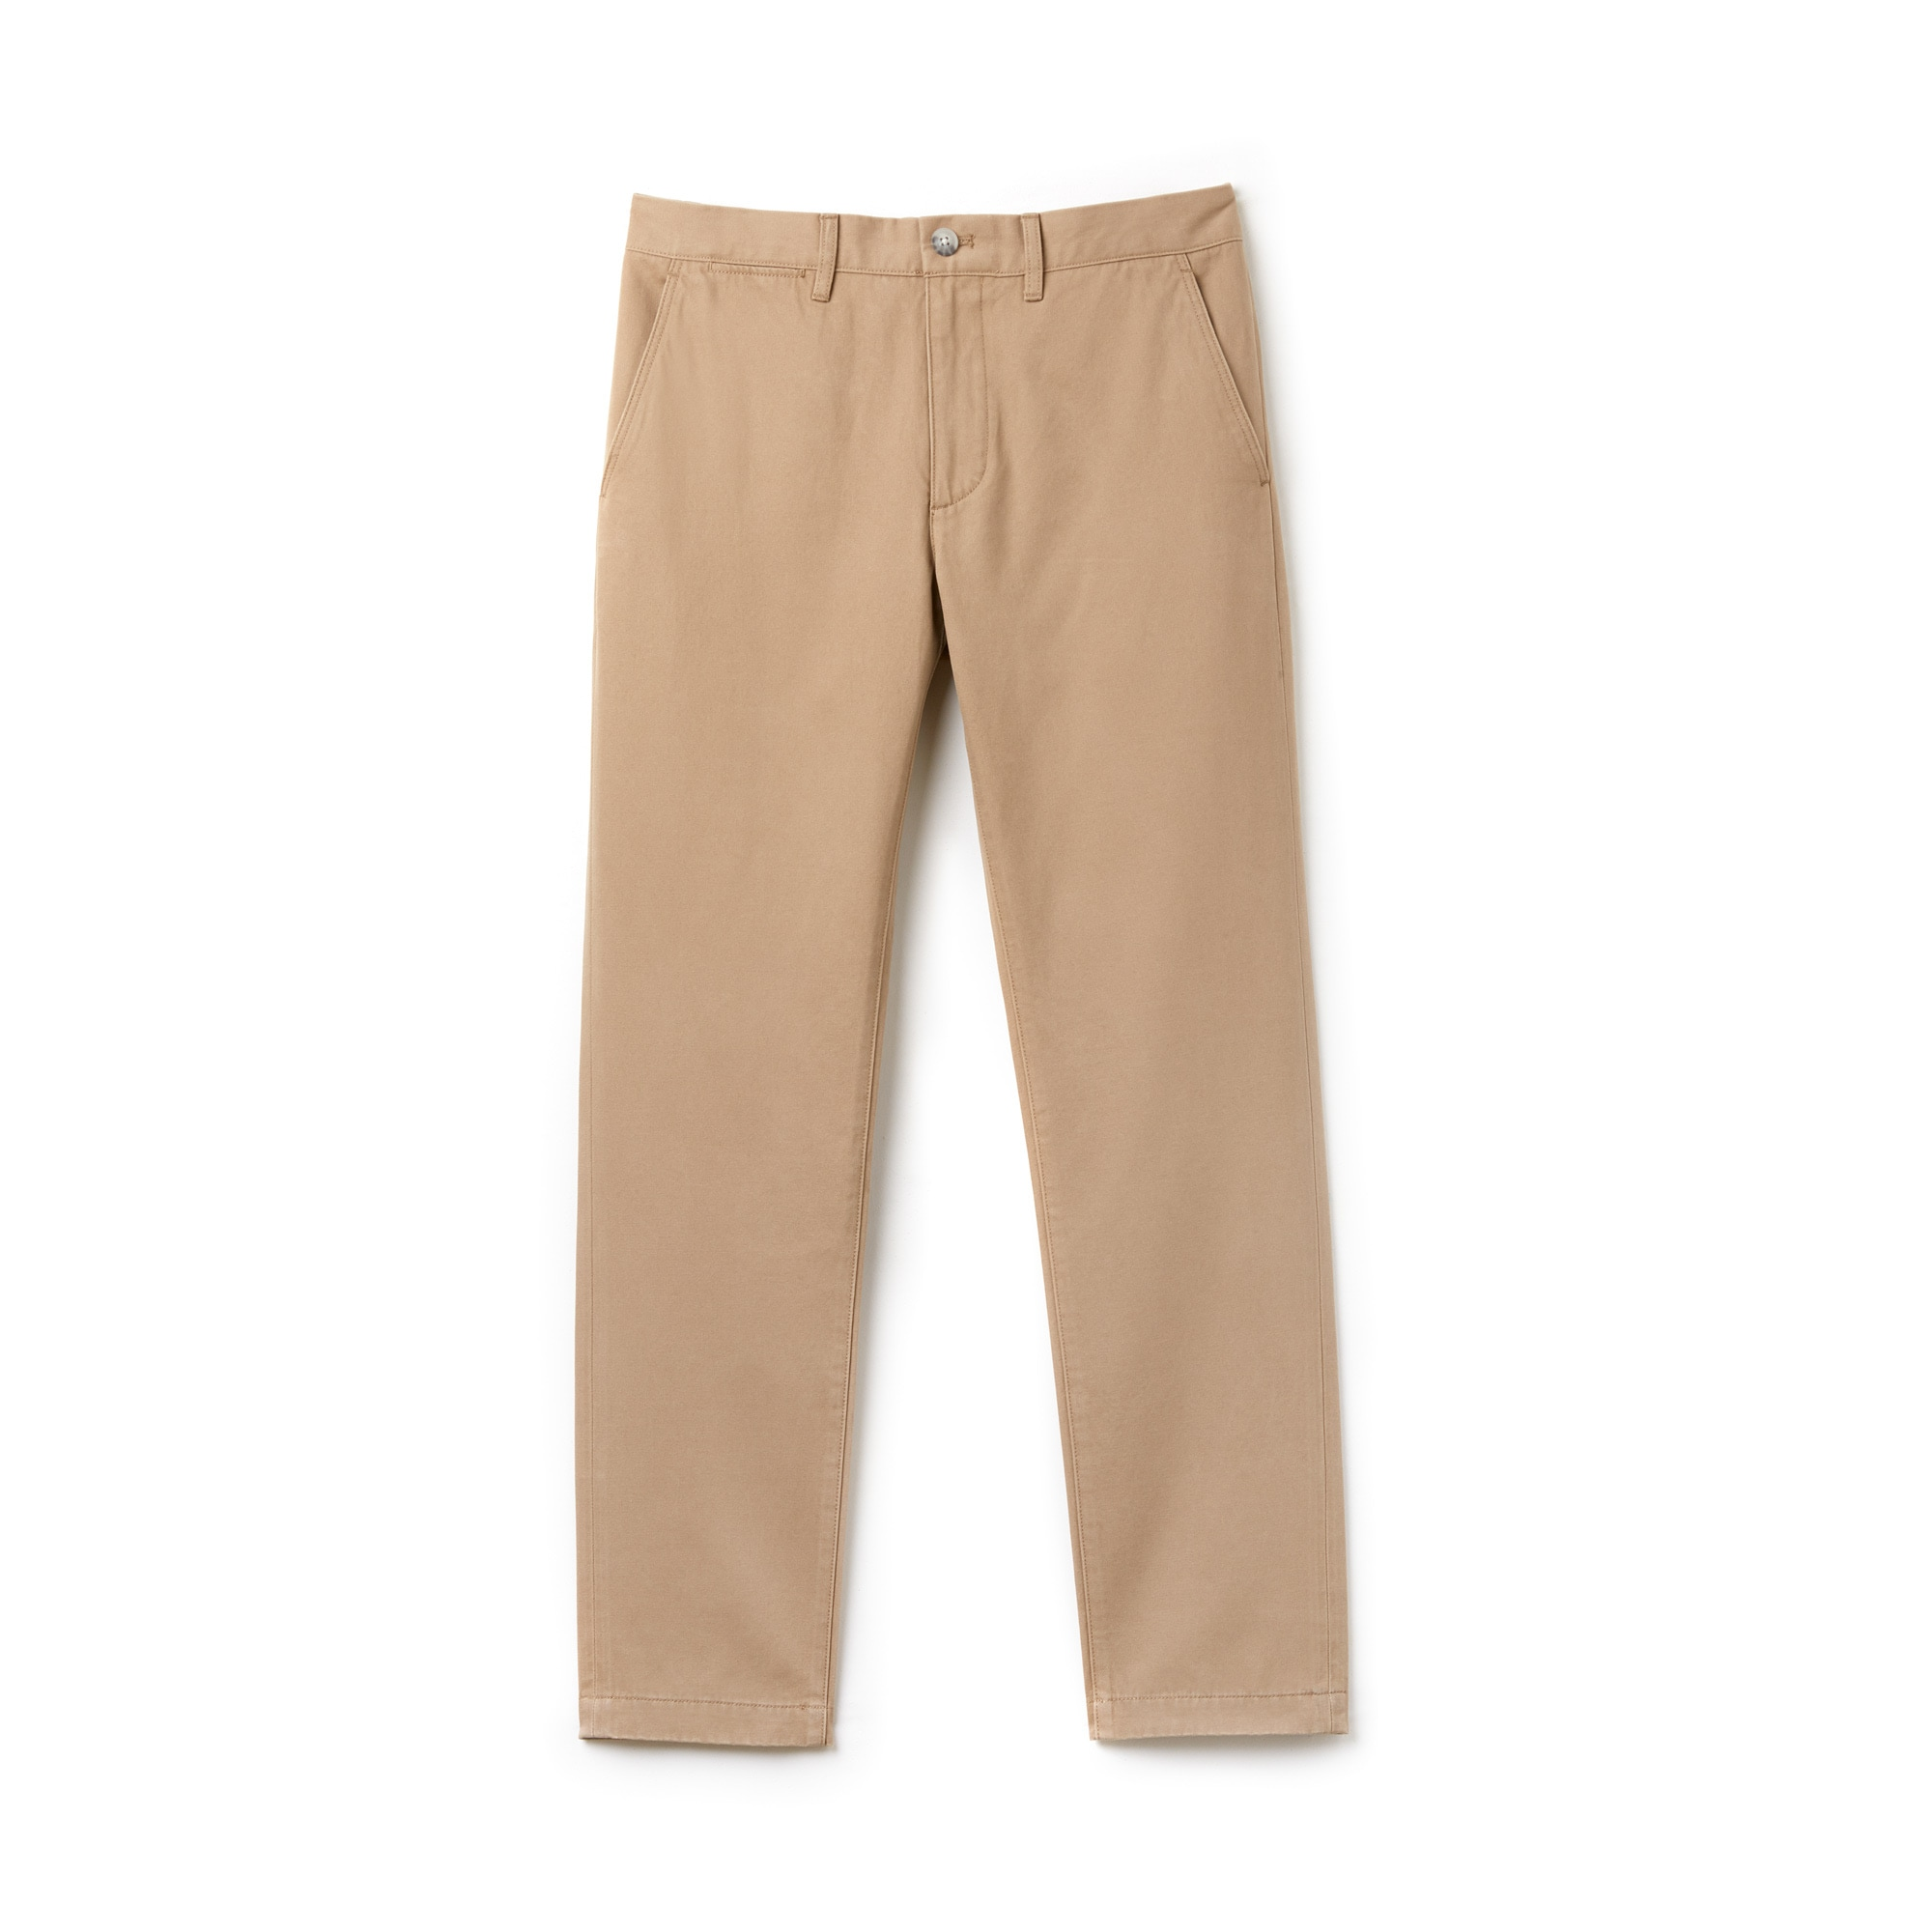 Pantalon chino regular fit en gabardine de coton unie